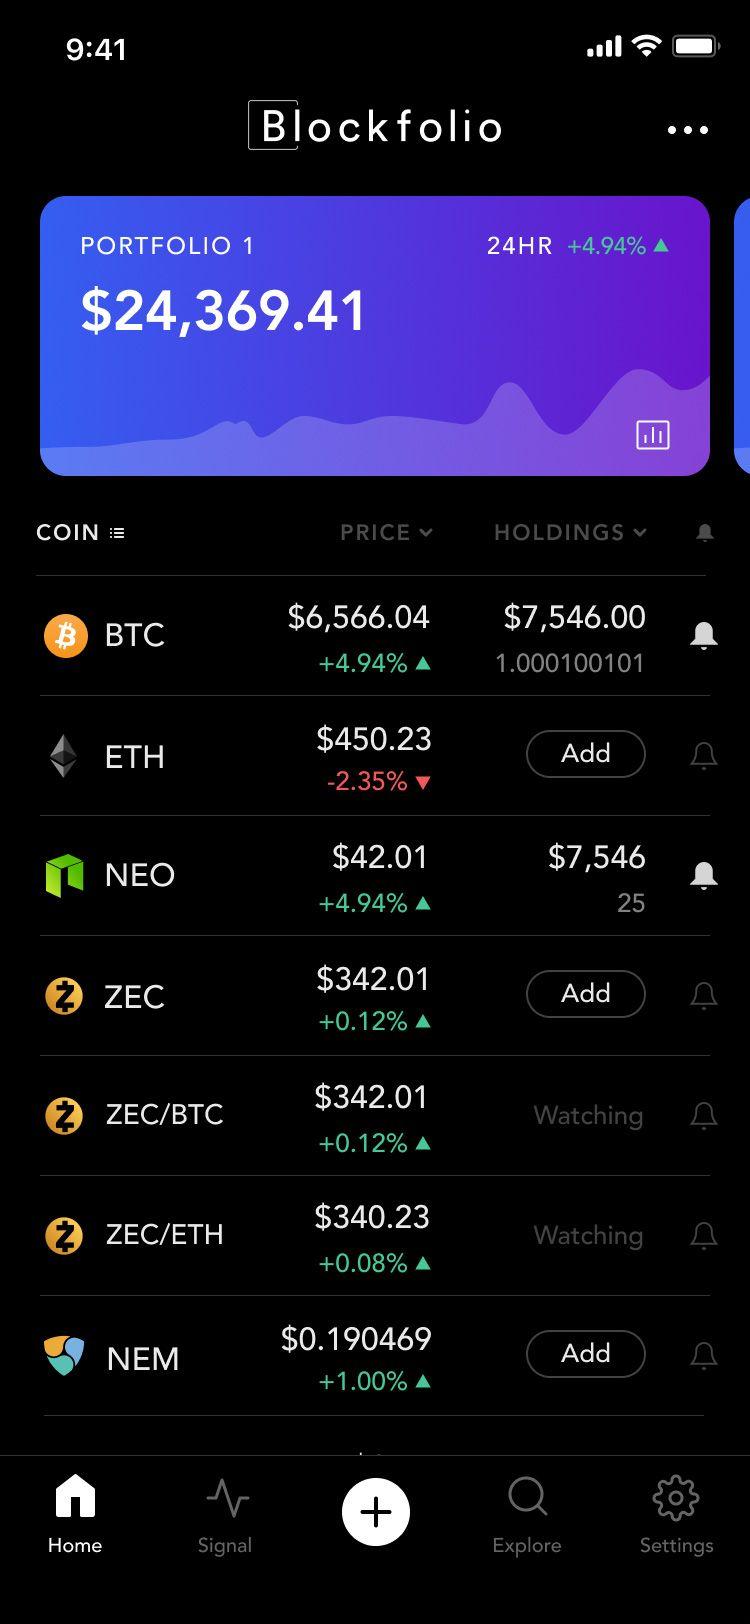 Blockfolio The World S Most Popular Cryptocurrency Portfolio Tracker Coin Prices Marketing Data Portfolio